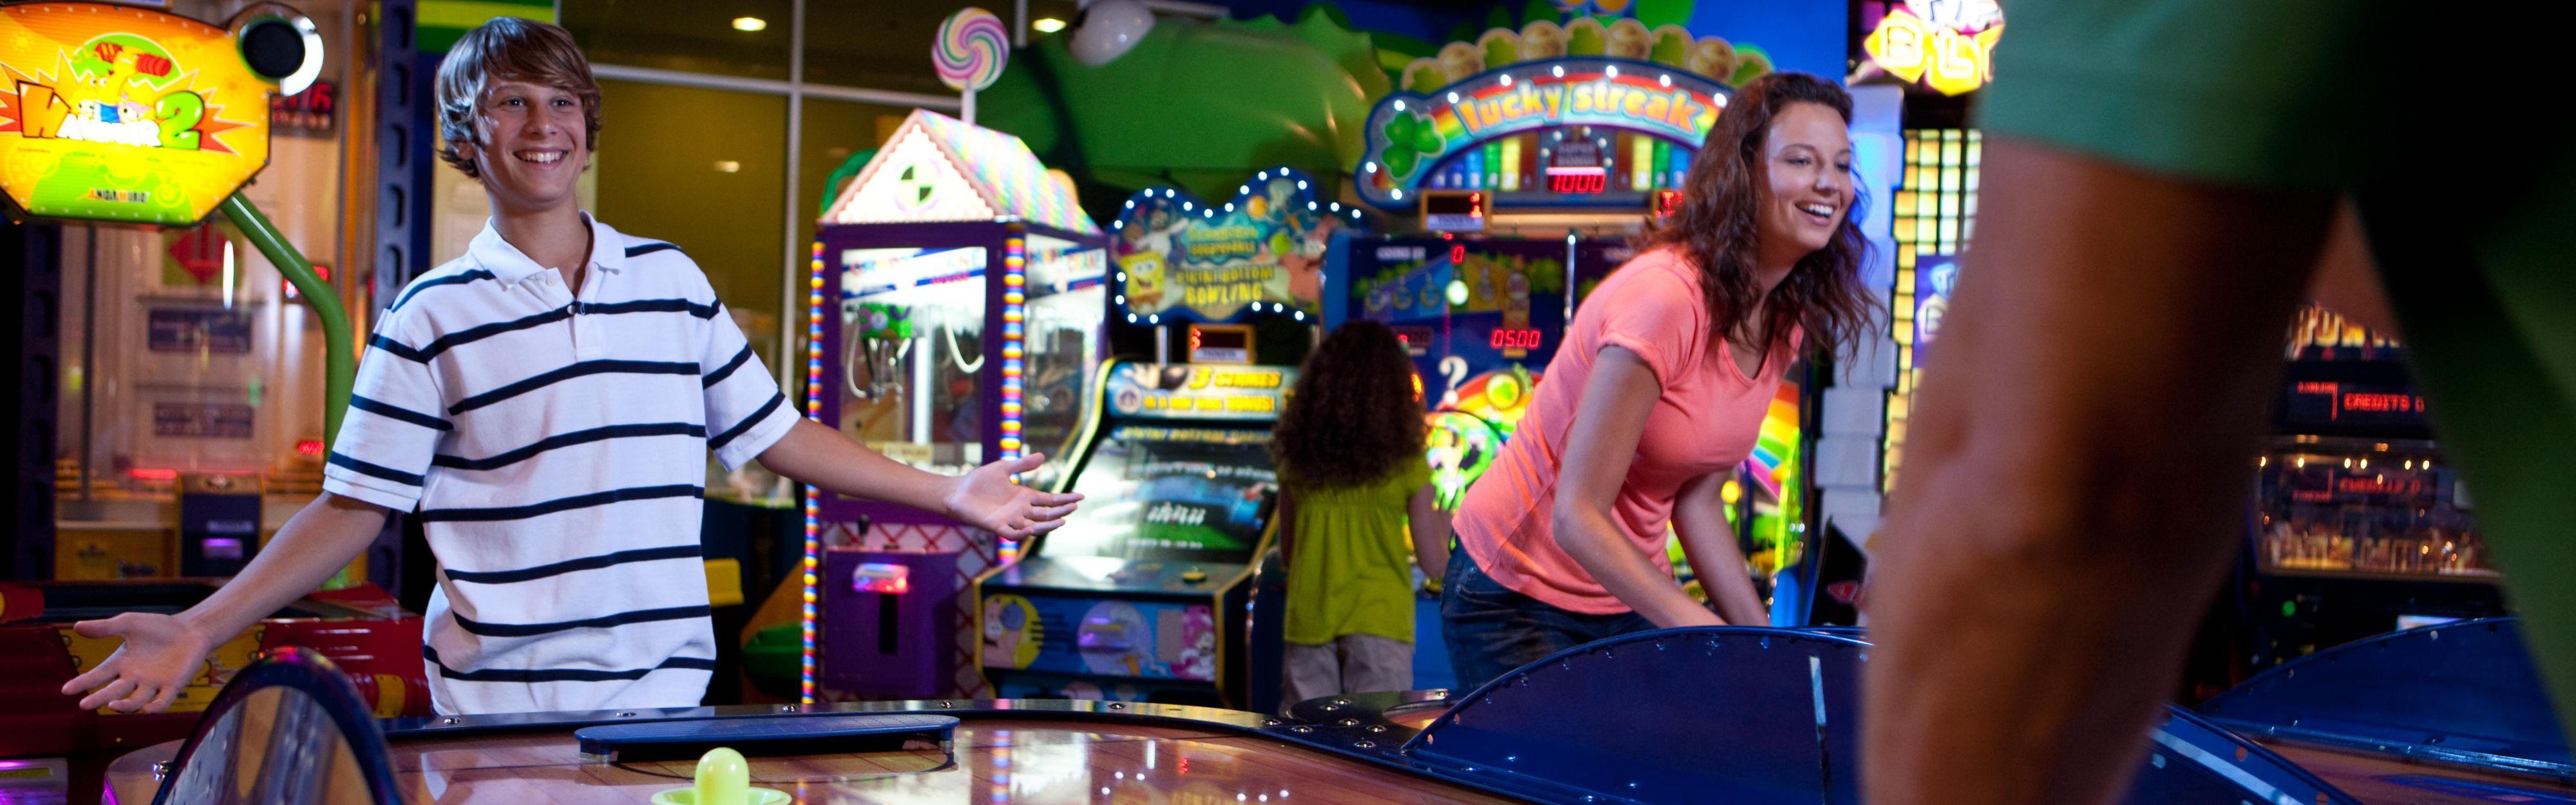 Orlando casino management network vegas casino games best odds